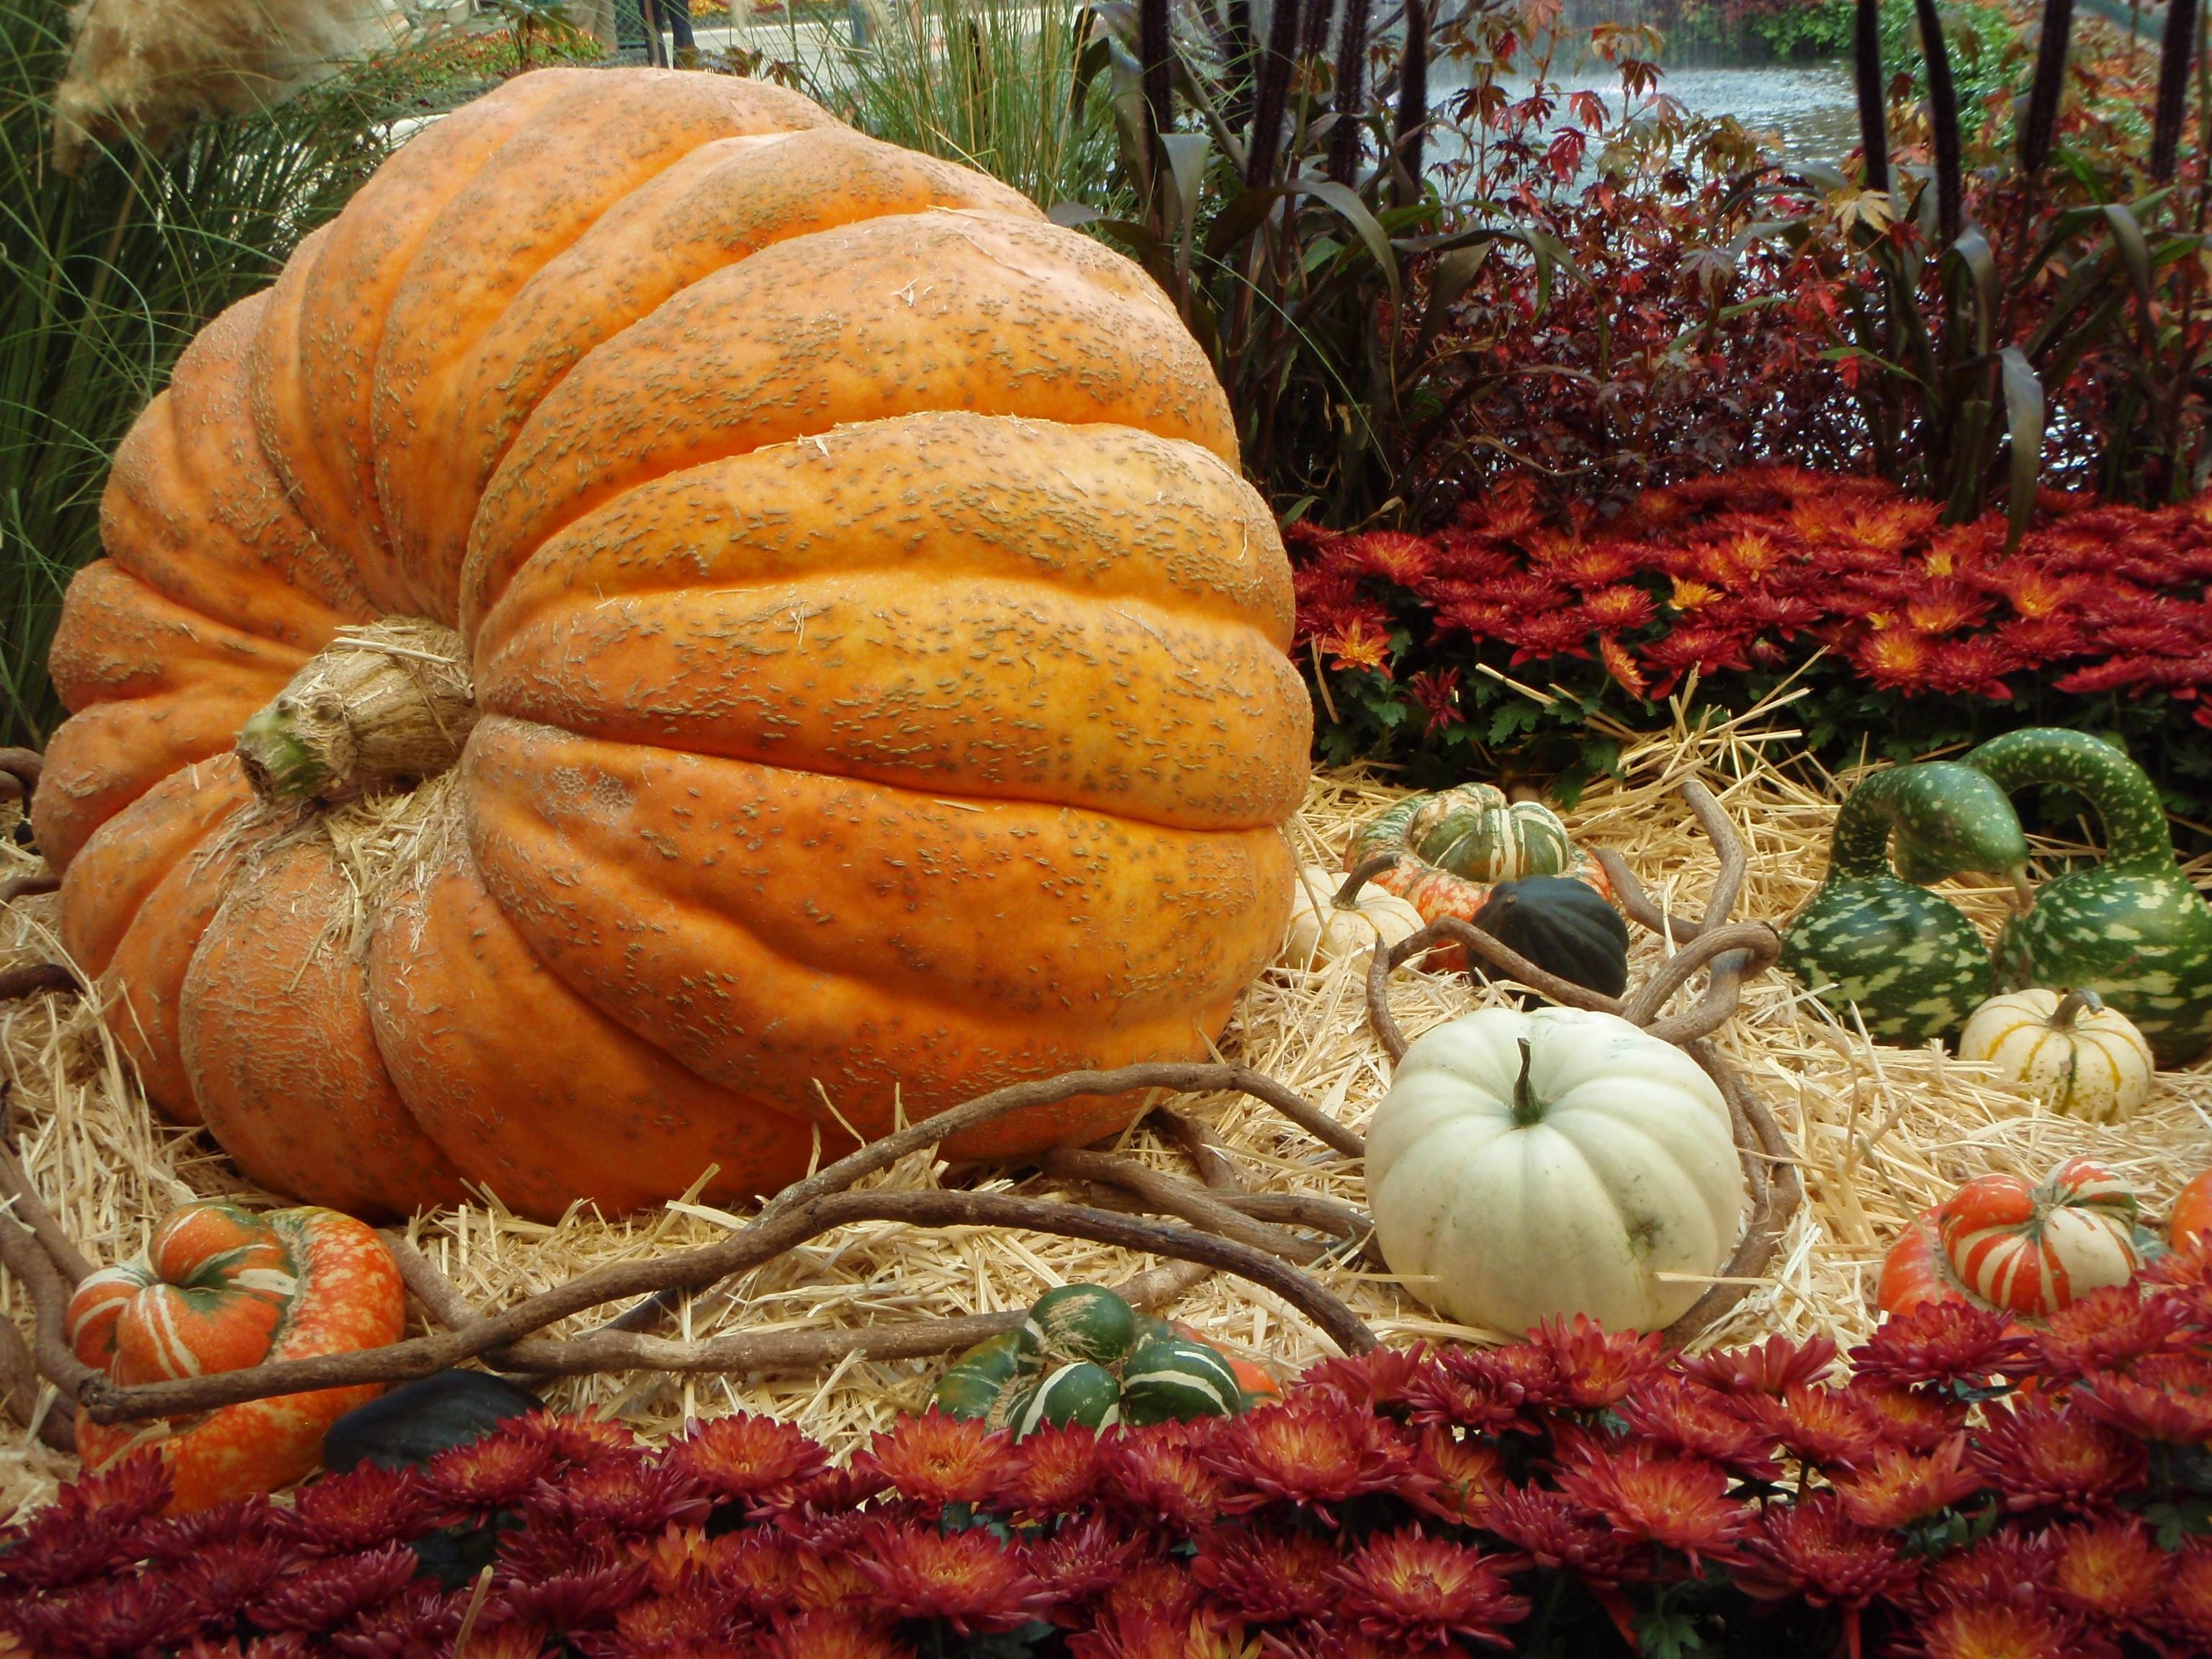 Pumpkin, California, Halloween, Usa, HQ Photo